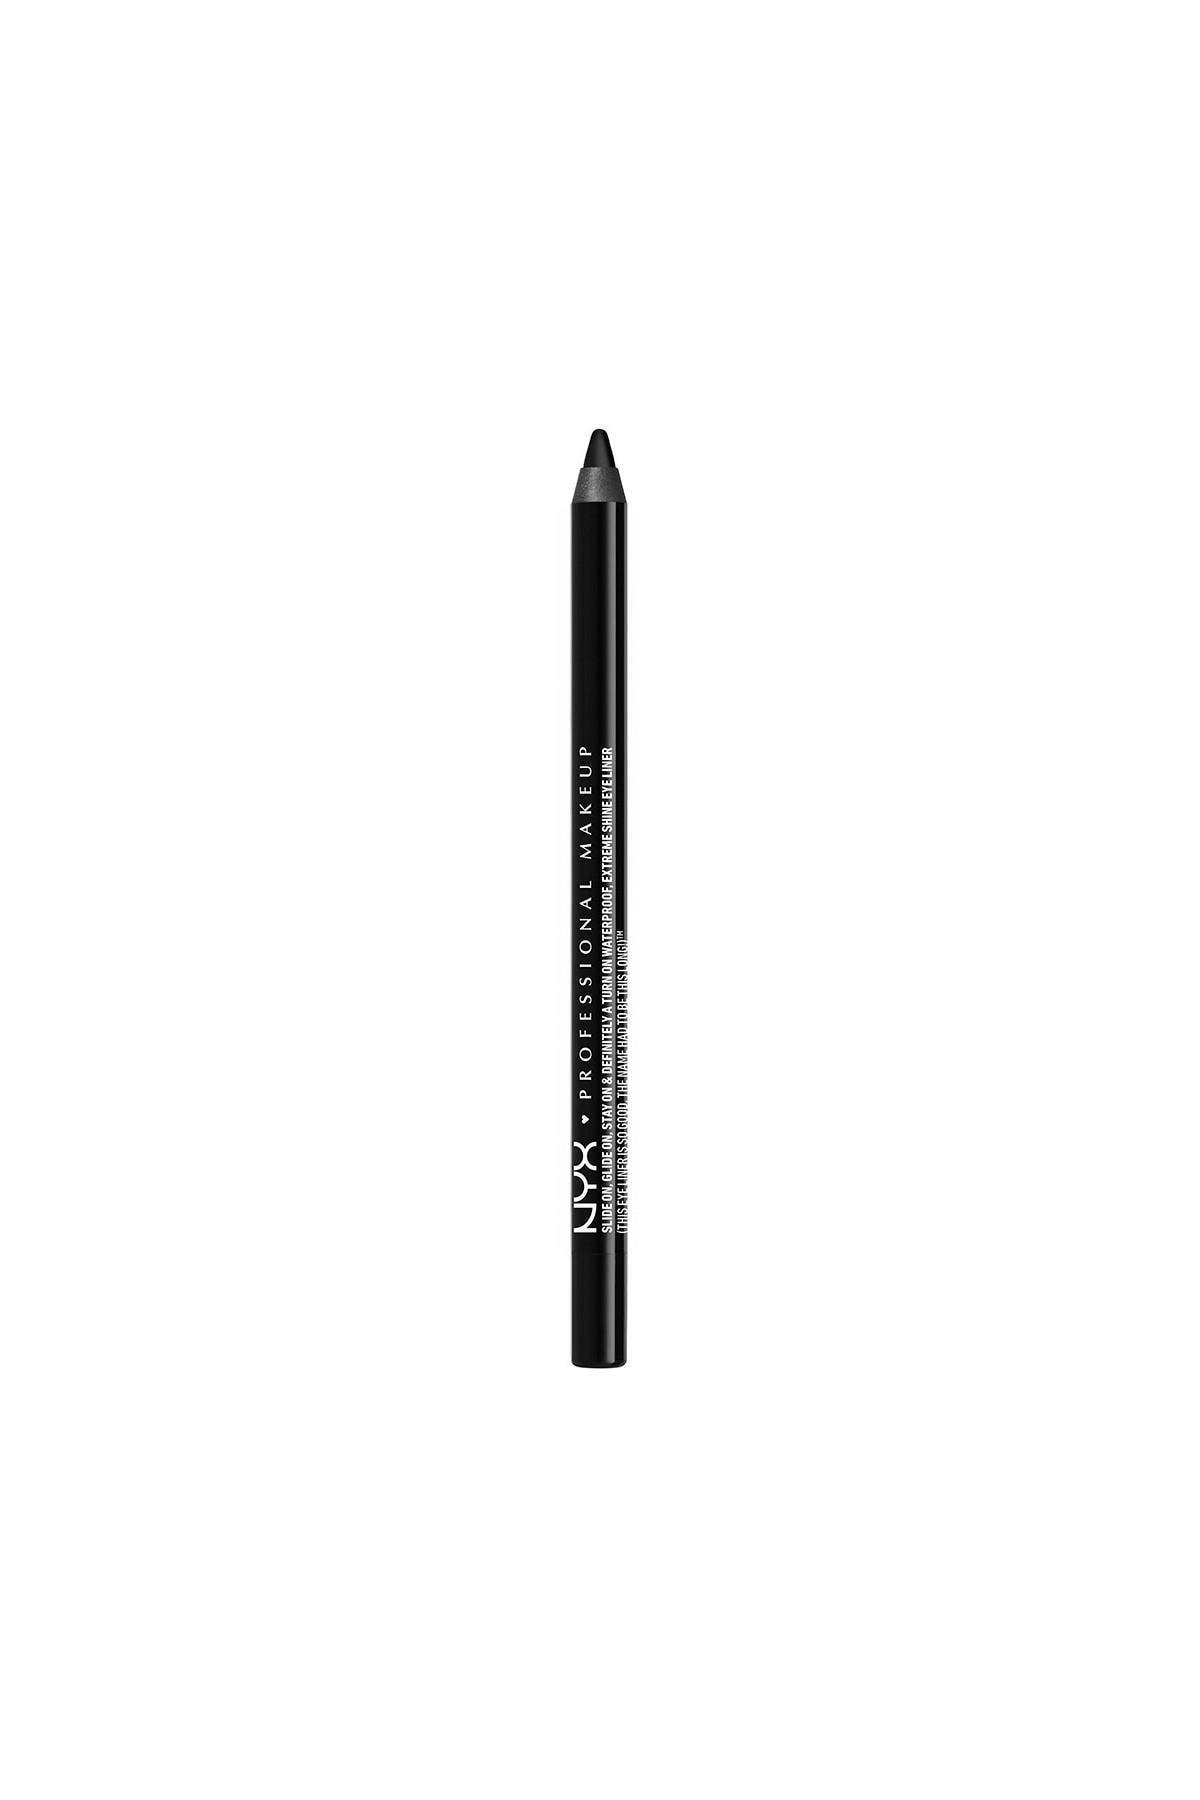 NYX Professional Makeup Siyah Göz Kalemi - Slide on Eye Pencil Jet Black 6 g 800897141226